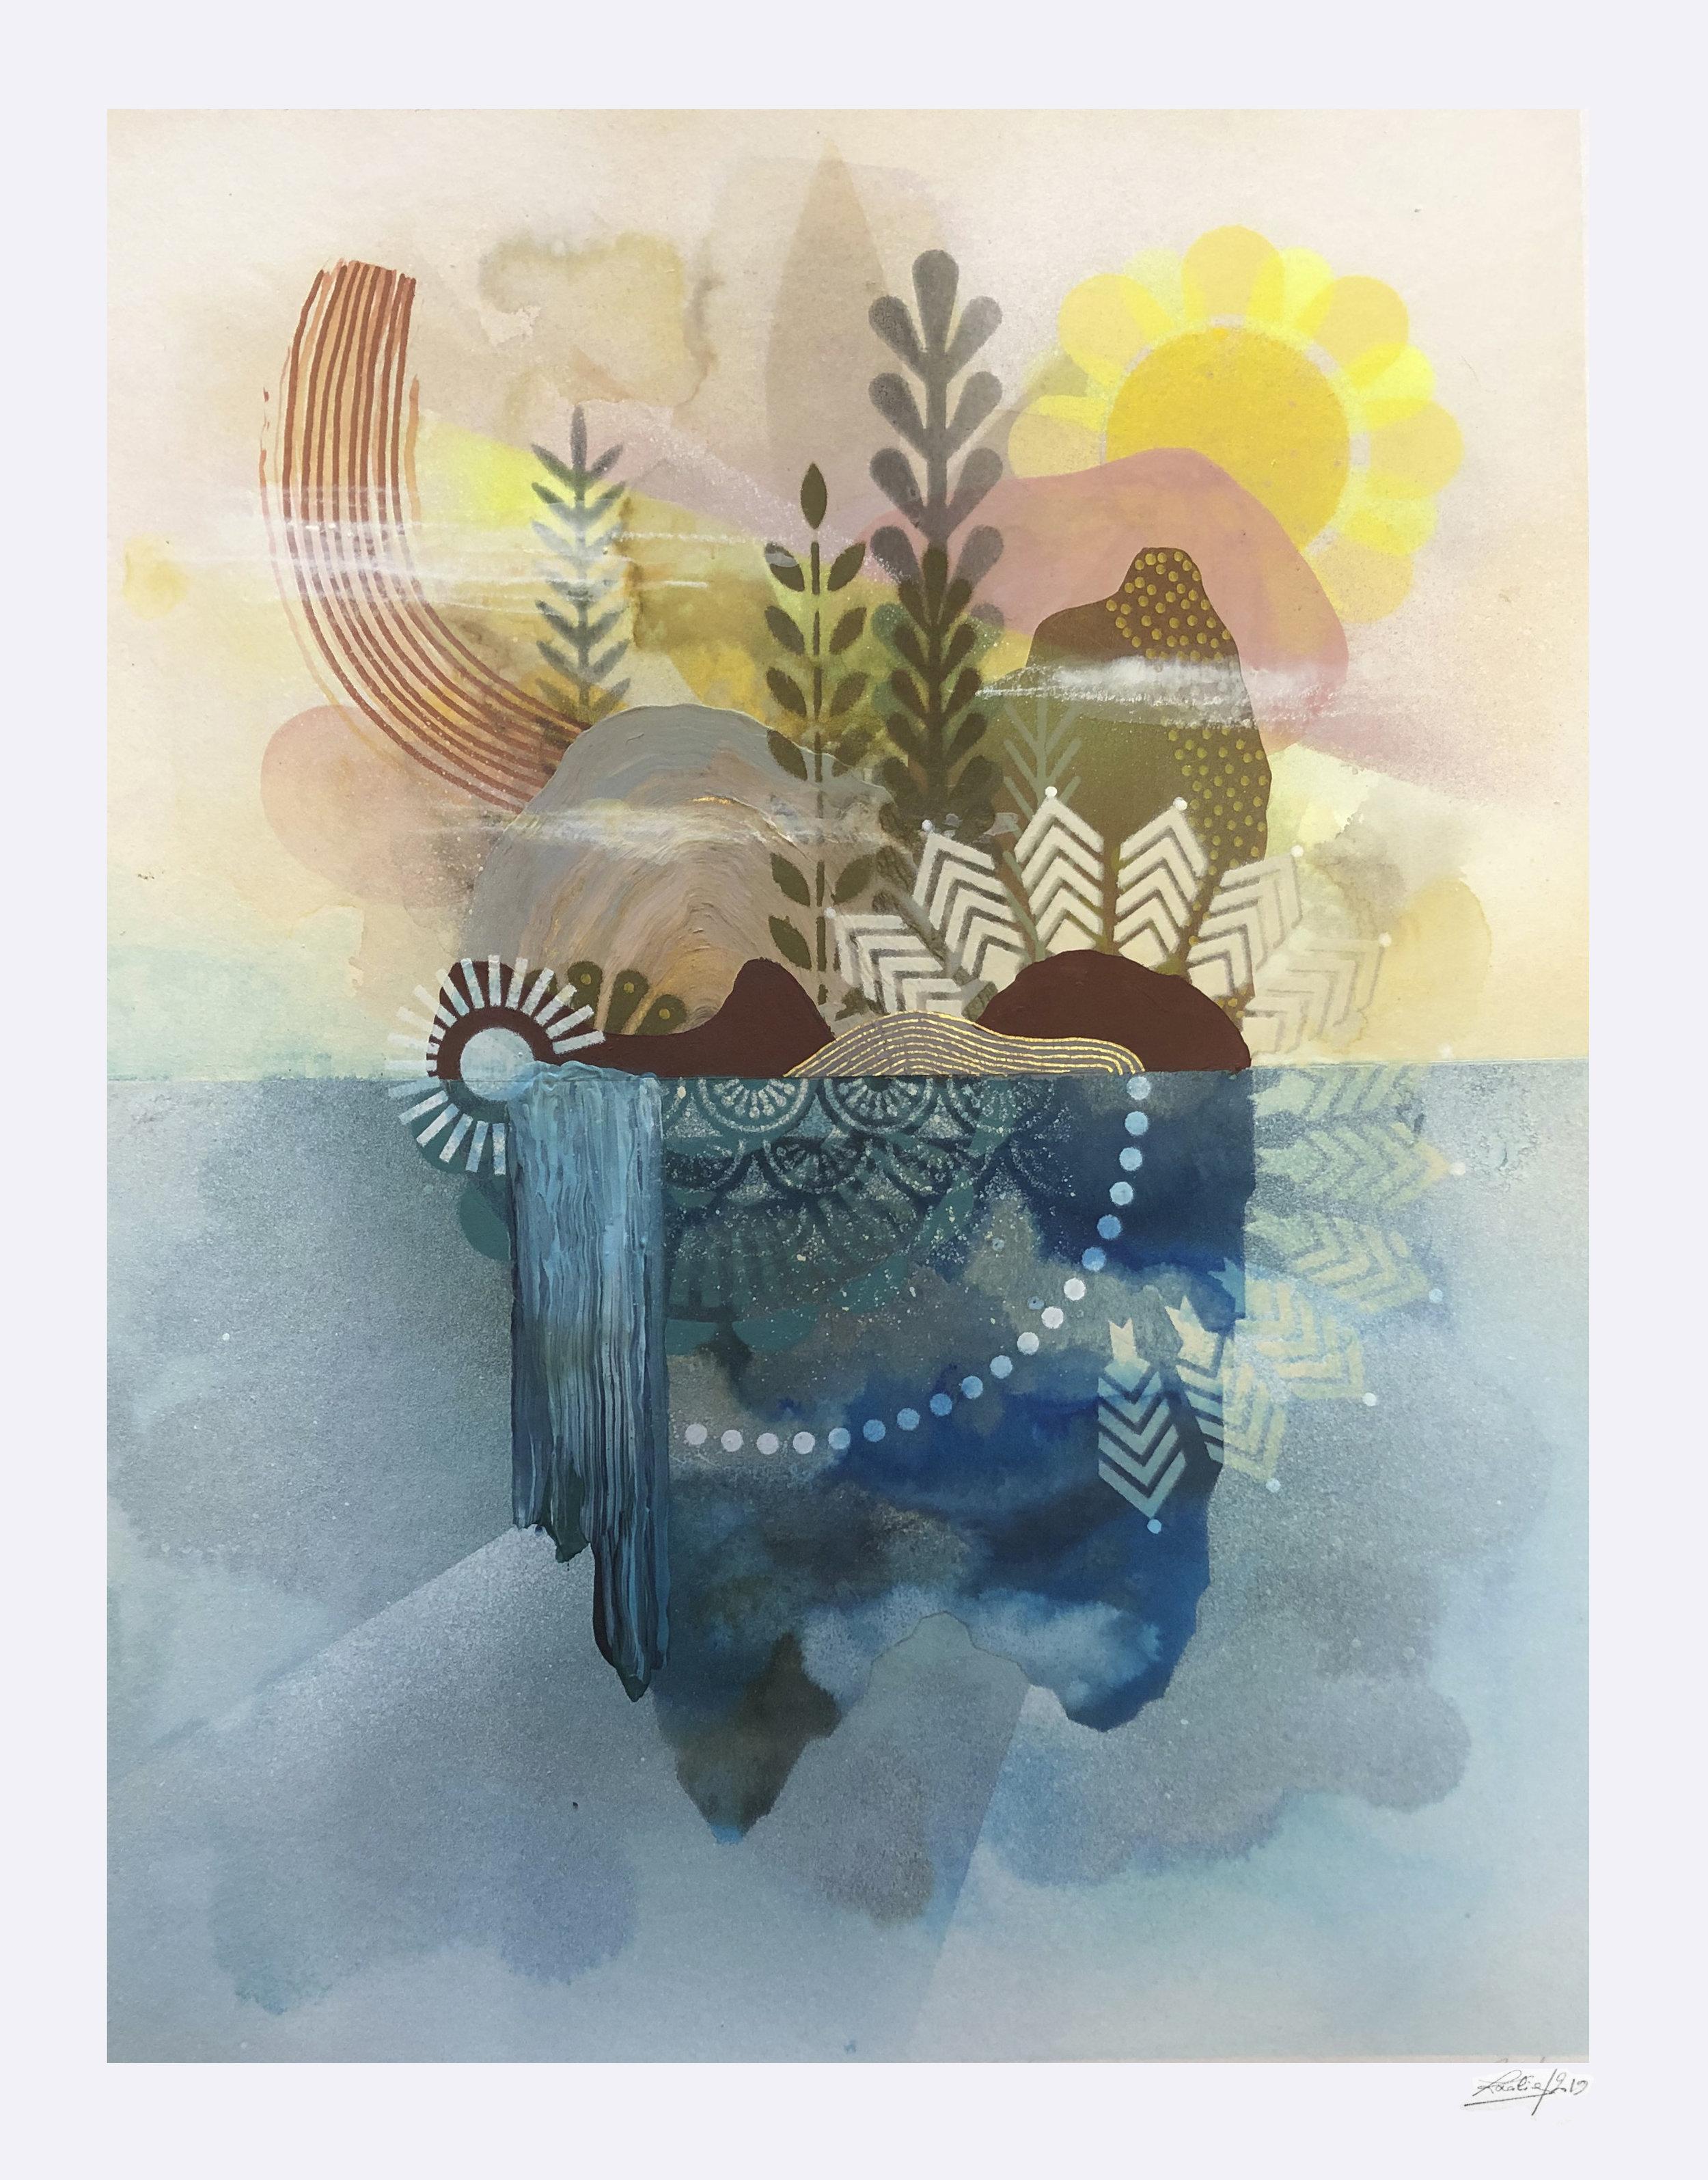 ardin Flottant #5  - Mix media on paper - 36 x46 cm | 2019